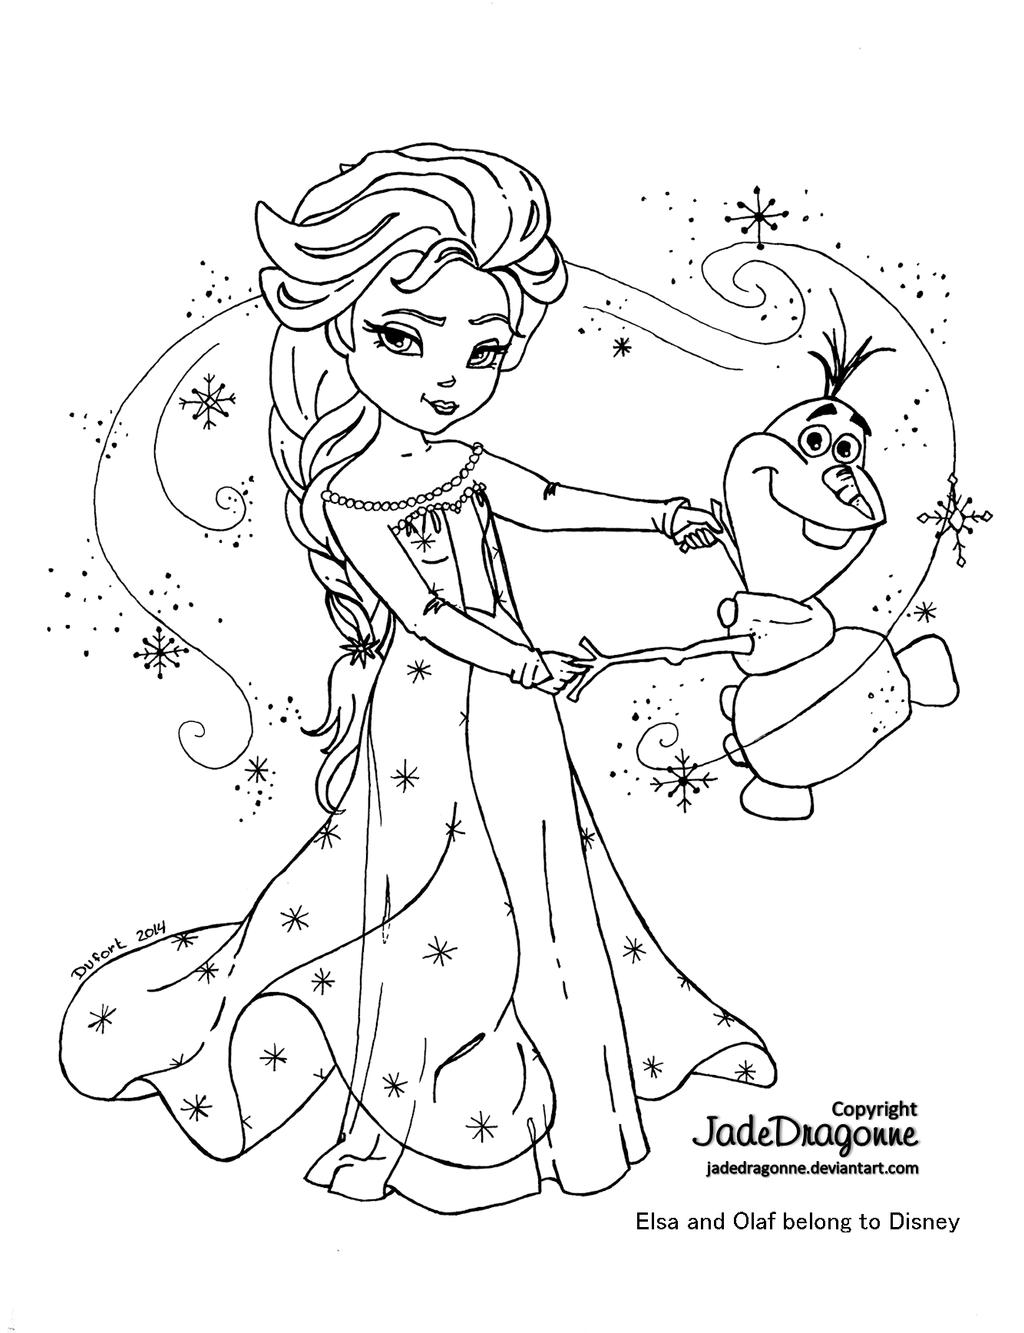 Elsa and olaf lineart by jadedragonne on deviantart - Coloriage frozen ...